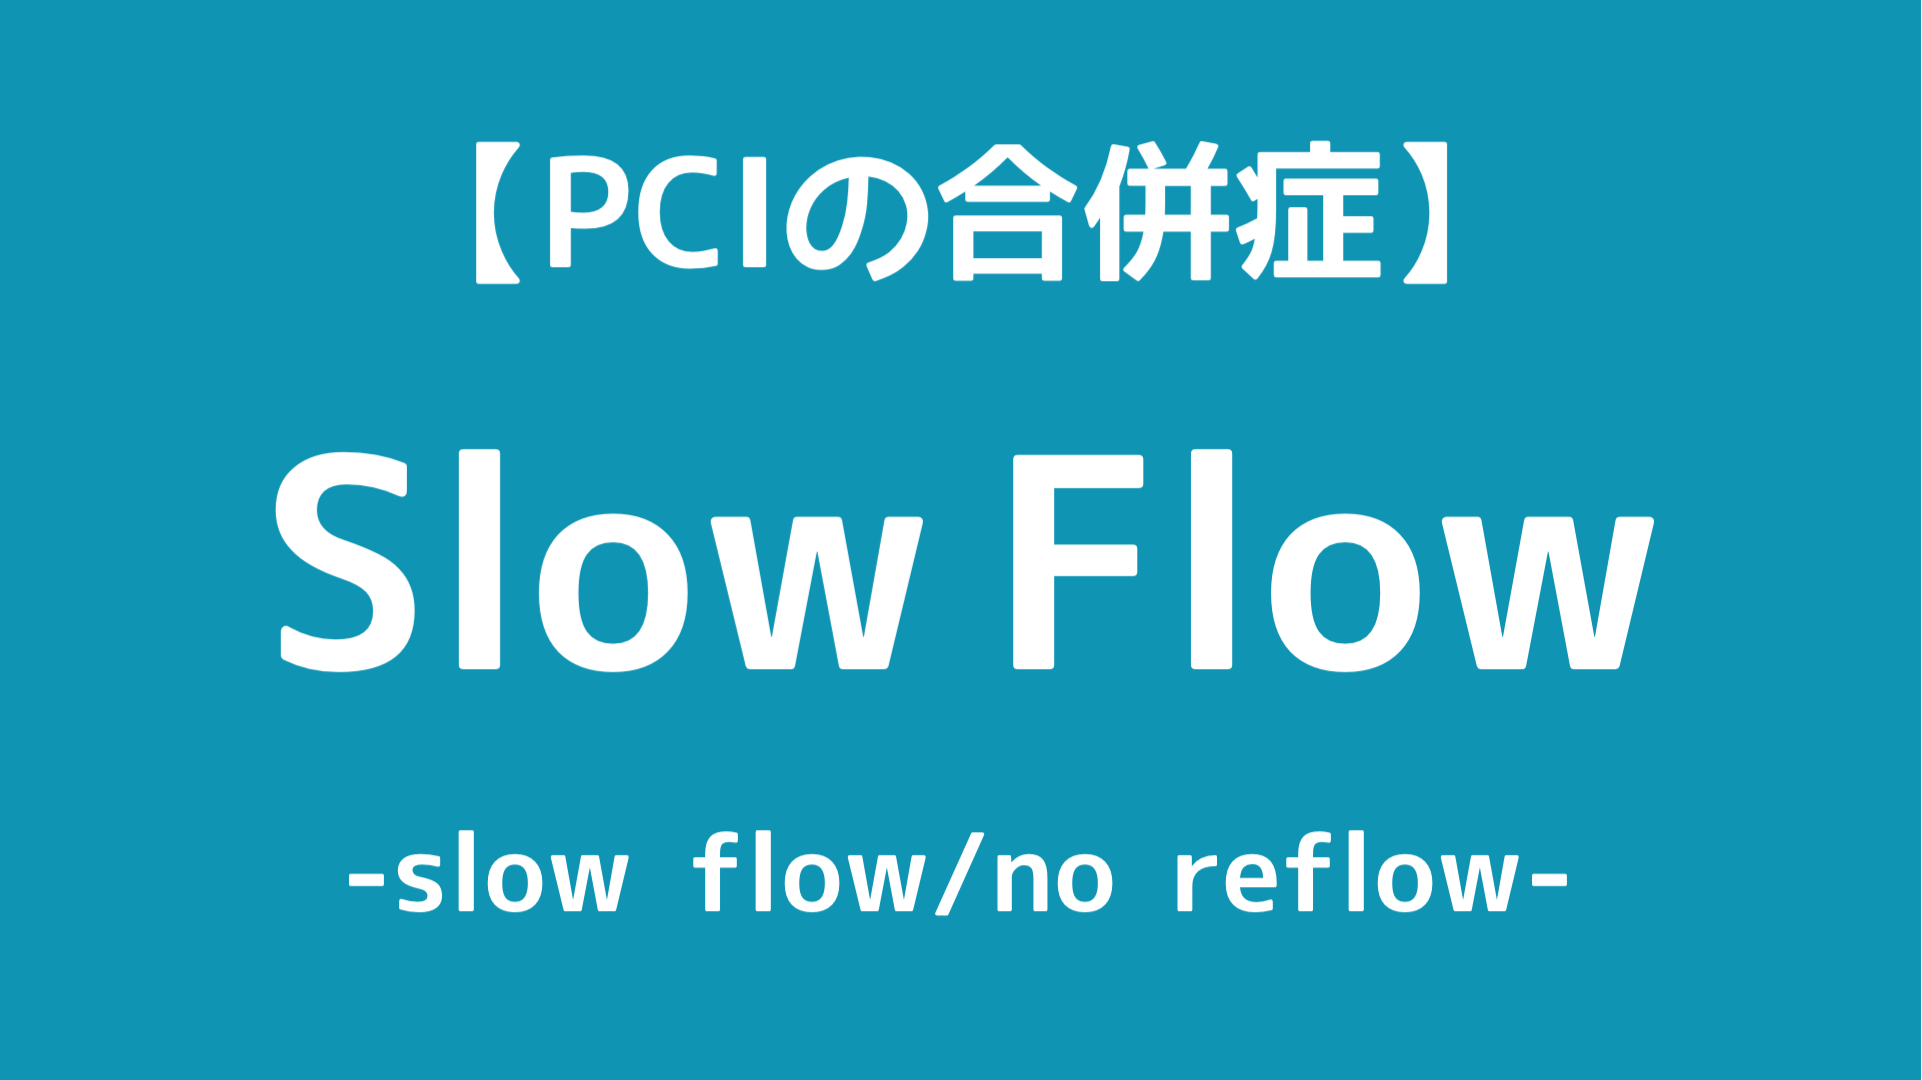 PCIで起こるSlow Flowの原因と対処方